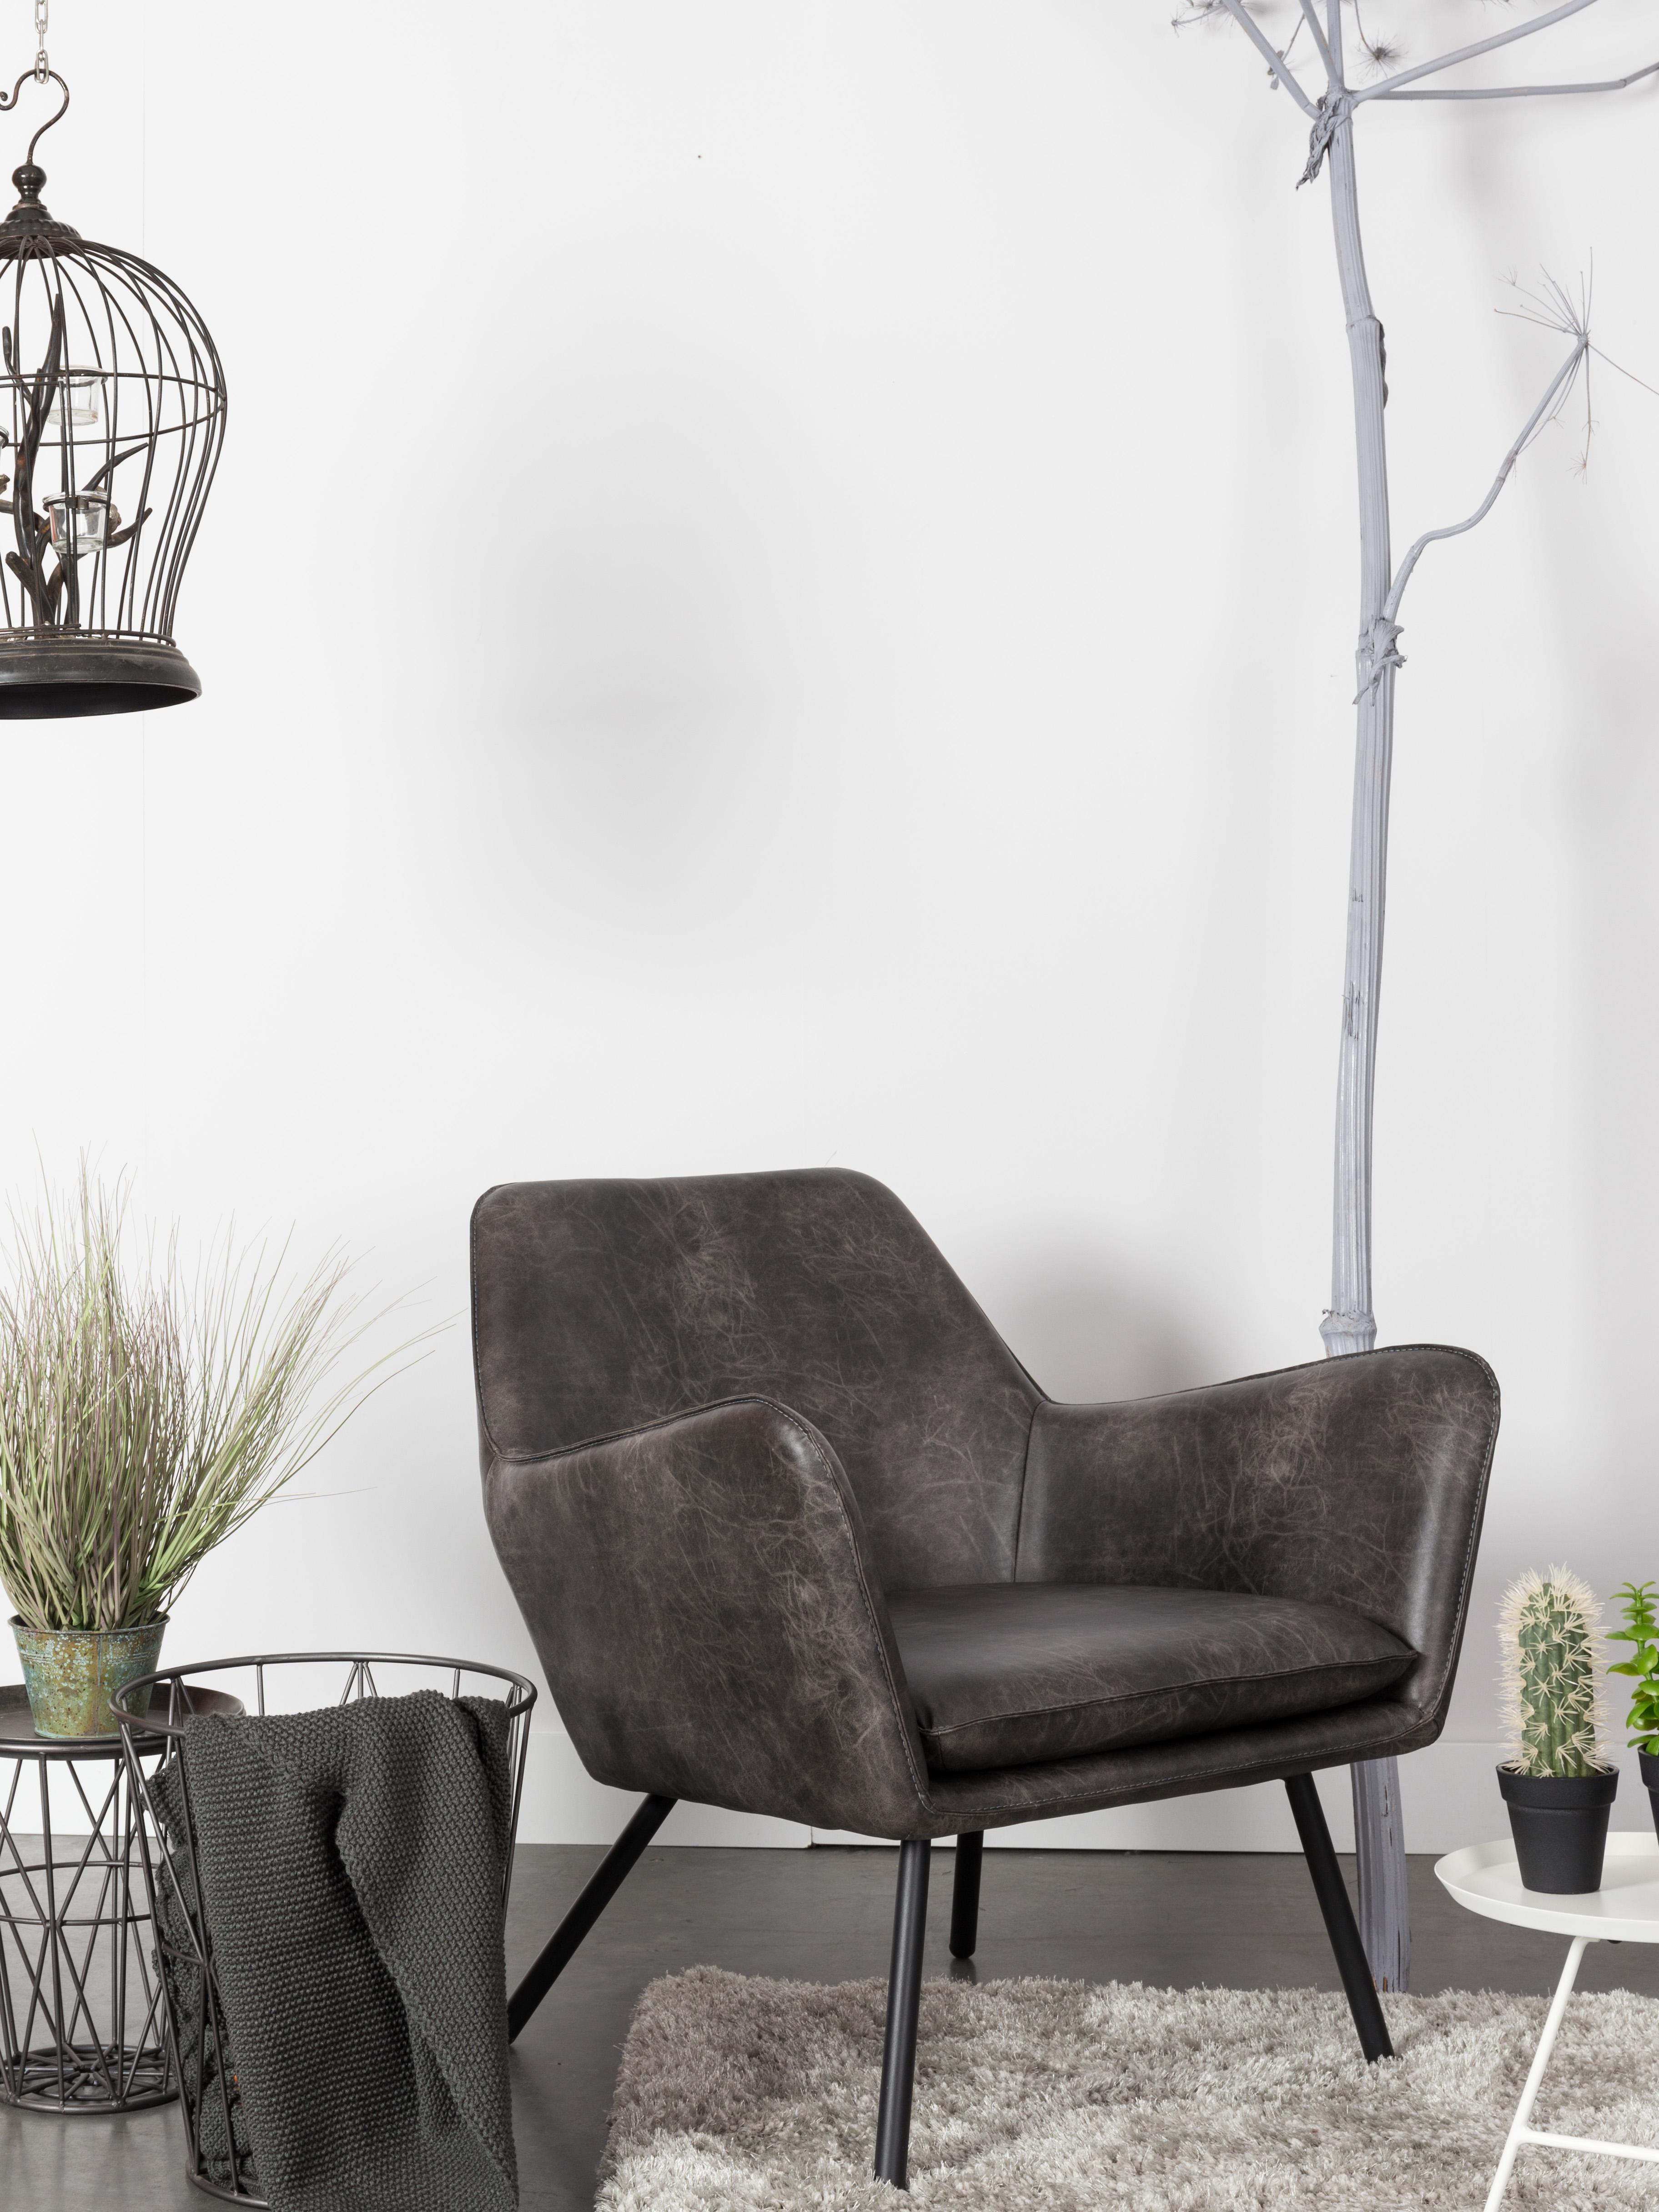 Kunstleder-Sessel Bon im Industrial Design, Bezug: Kunstleder (64% Polyureth, Füße: Metall, lackiert, Bezug: Schwarz, strukturiert<br>Füße: Schwarz, 80 x 78 cm